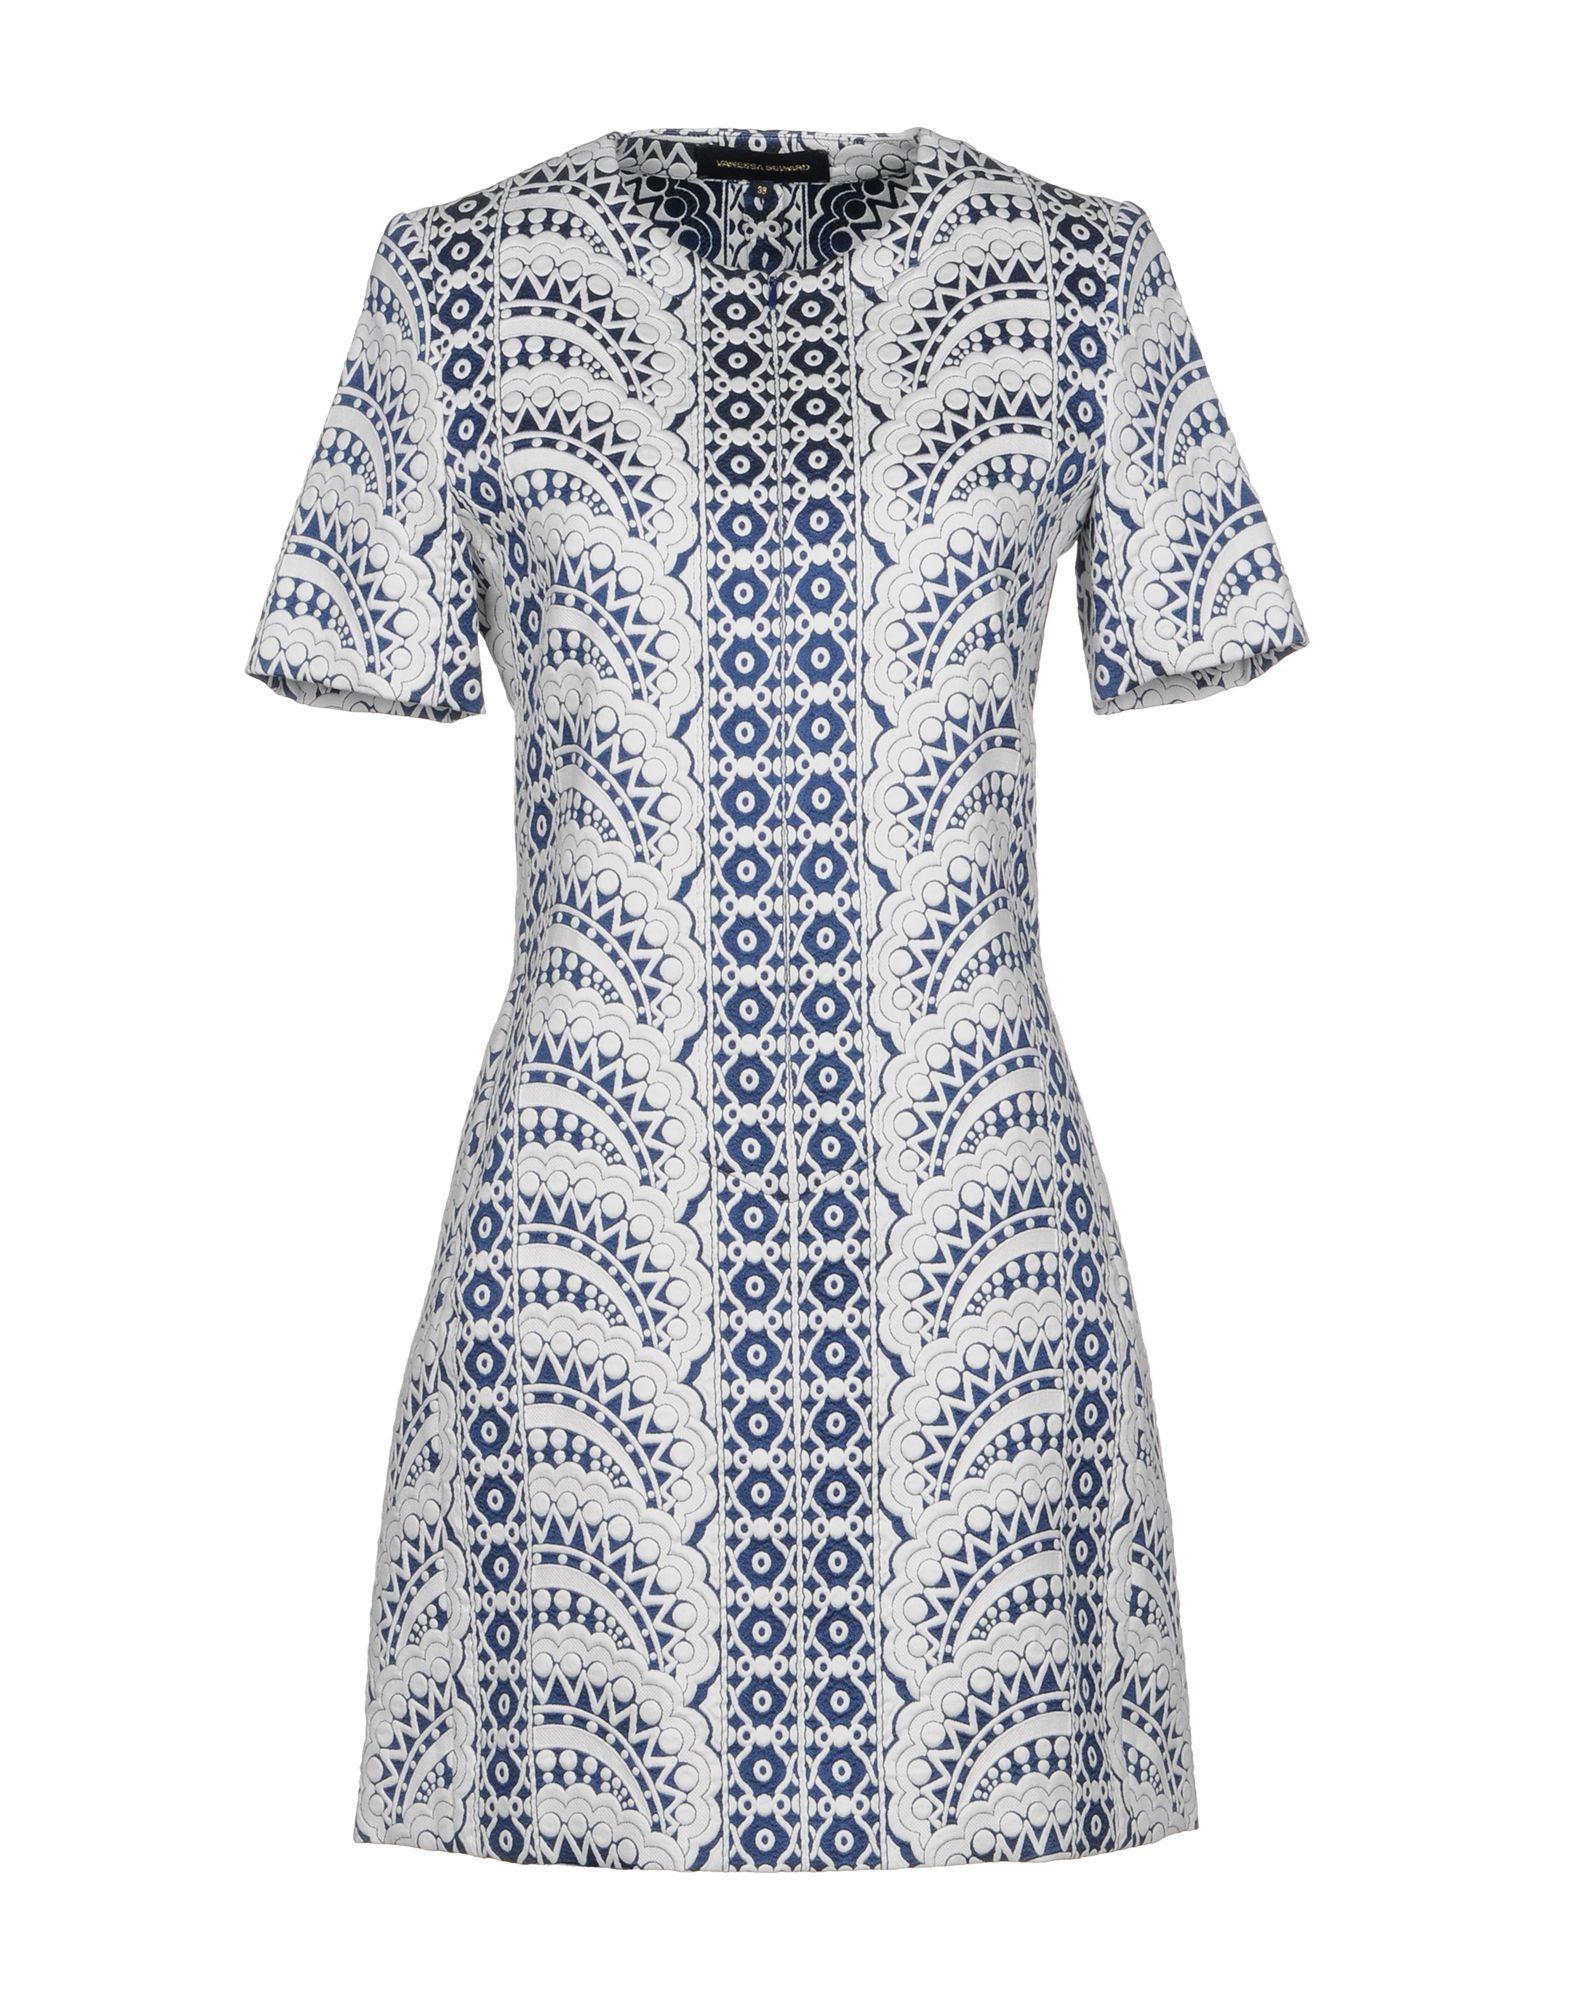 Vanessa Seward Short Dresses In White